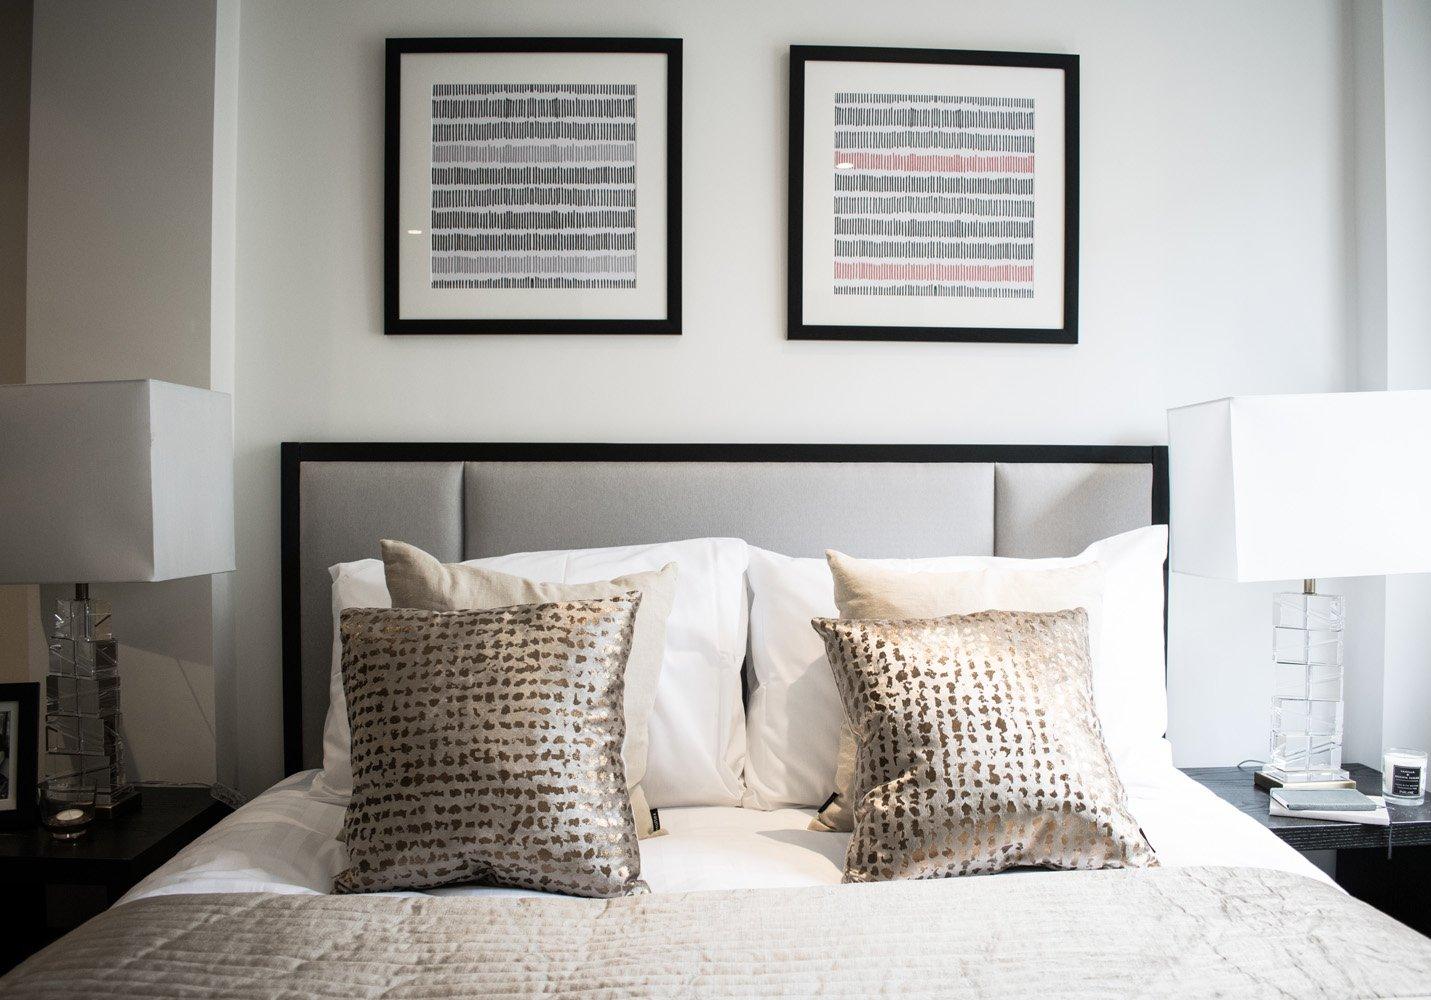 Marylebone-Luxury-Accommodation-Central-London-Serviced-Apartments-Near-Oxford-Street,-Bond-Street-&-Hyde-Park-Urban-Stay-8